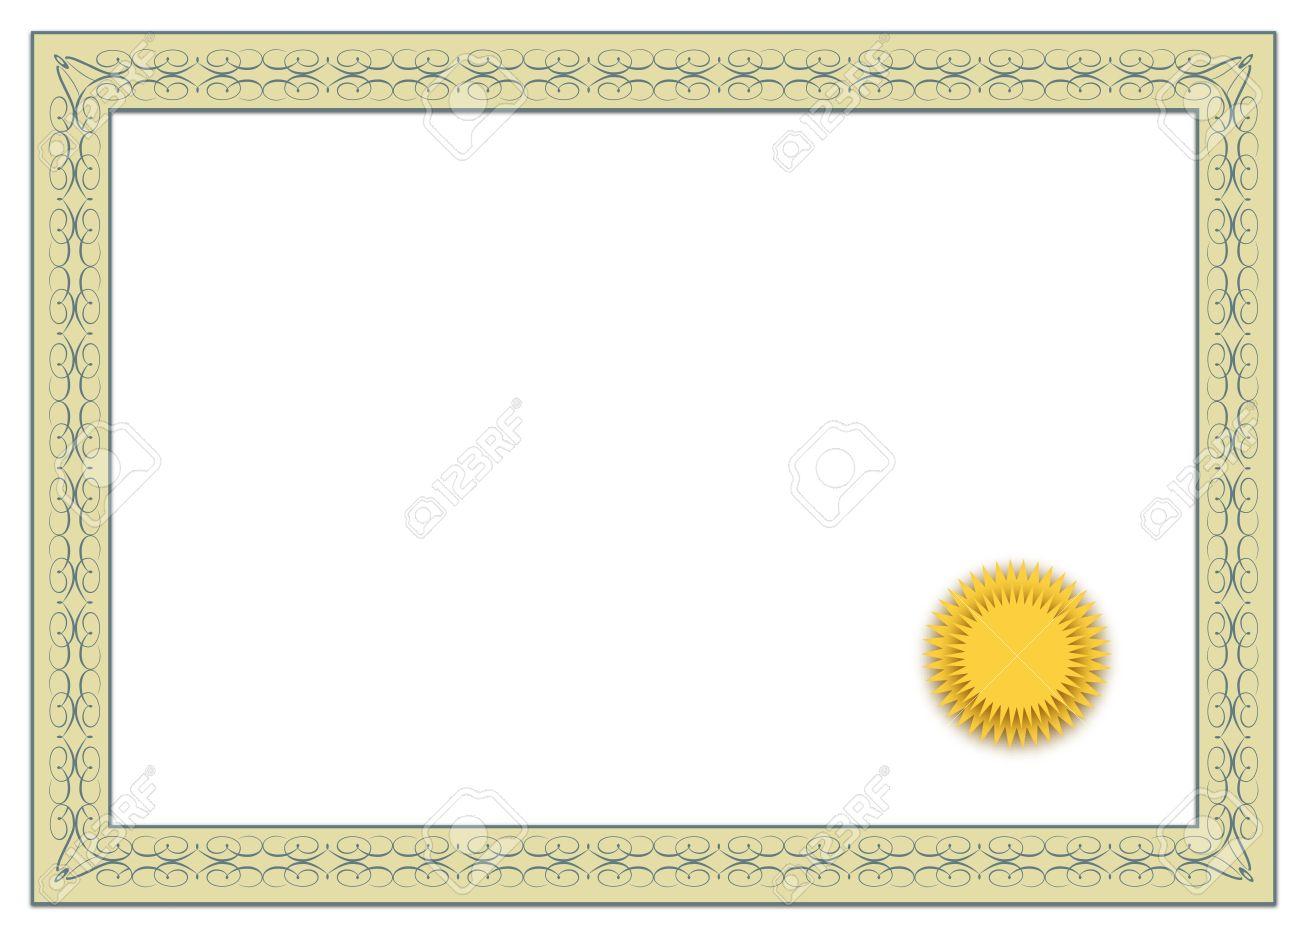 Un Marco Simple De Un Diploma Típico. Todos Aislados Sobre Fondo ...